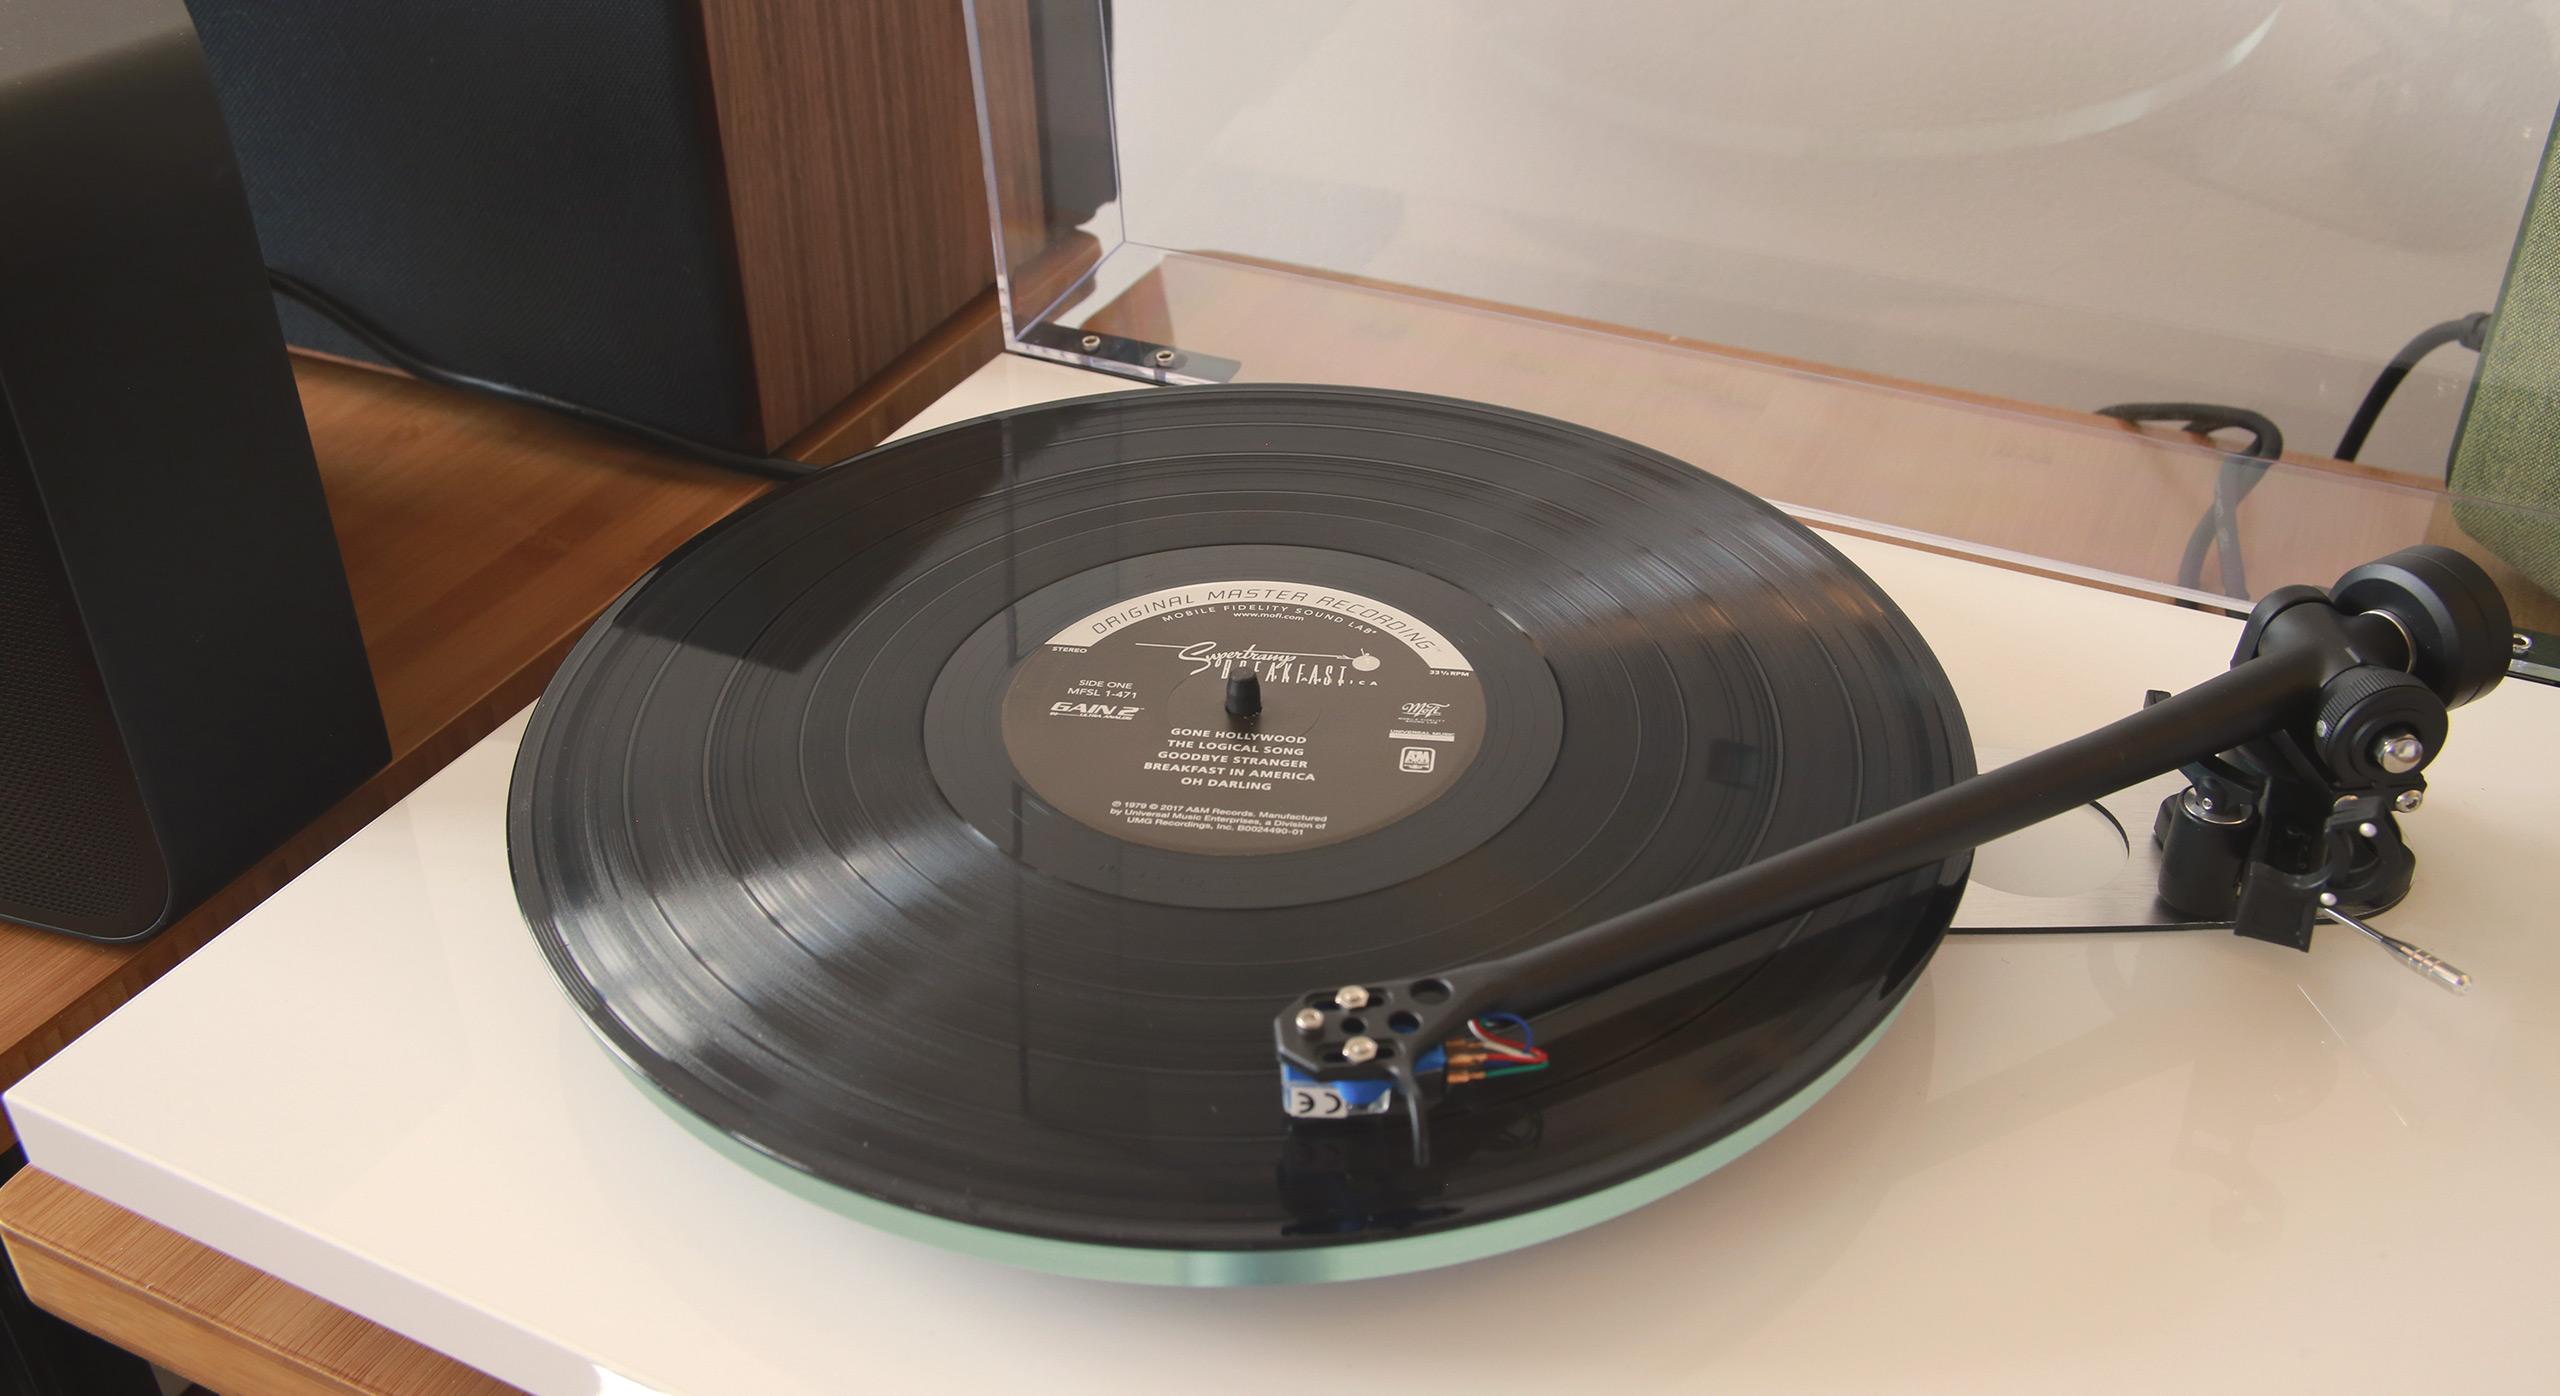 Le disque vinyle Supertramp Breakfast in America disposé sur la platine vinyle Rega Planar 3